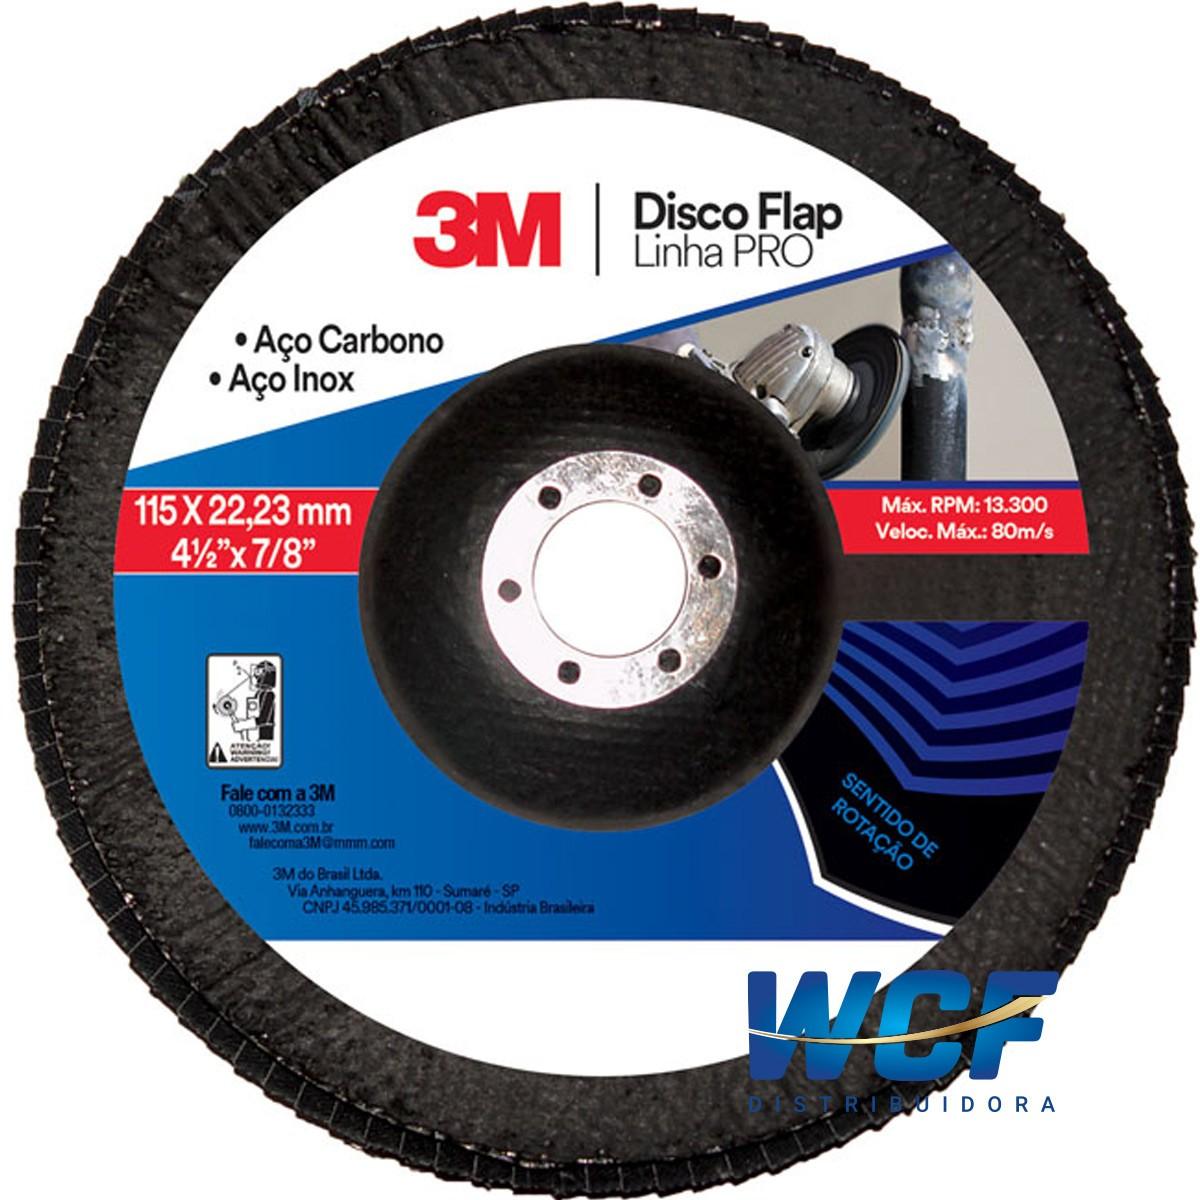 3M DISCO FLAP DISC 80